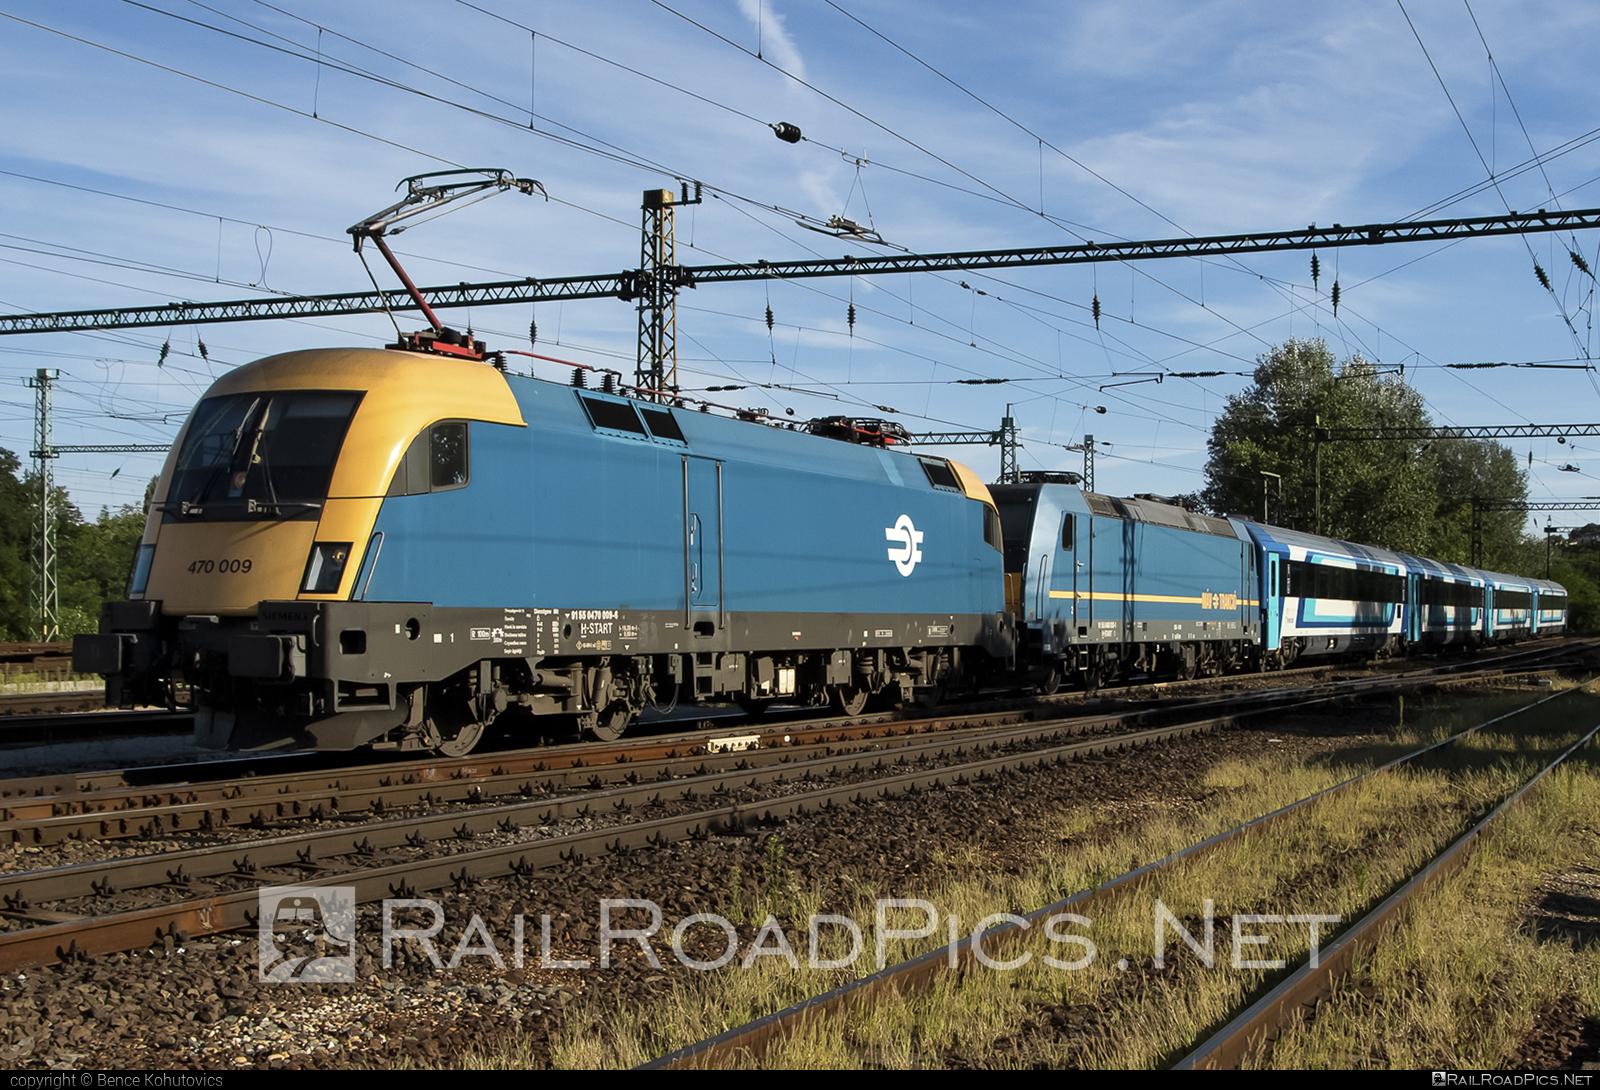 Siemens ES 64 U2 - 470 009 operated by MÁV-START ZRt. #es64 #es64u #es64u2 #eurosprinter #mav #mavstart #mavstartzrt #siemens #siemenses64 #siemenses64u #siemenses64u2 #siemenstaurus #taurus #tauruslocomotive